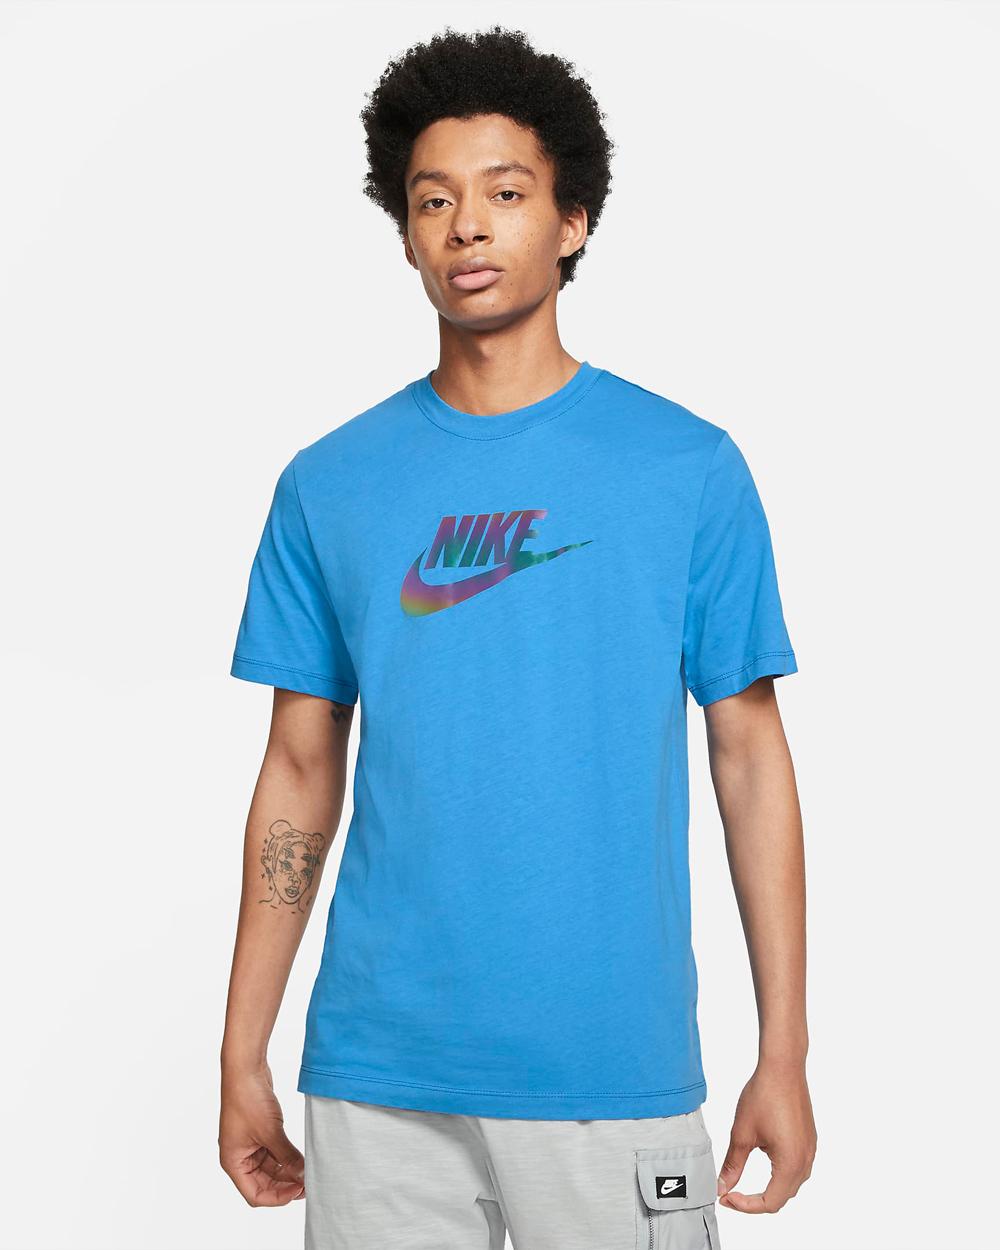 nike-iridescent-shirt-blue-2